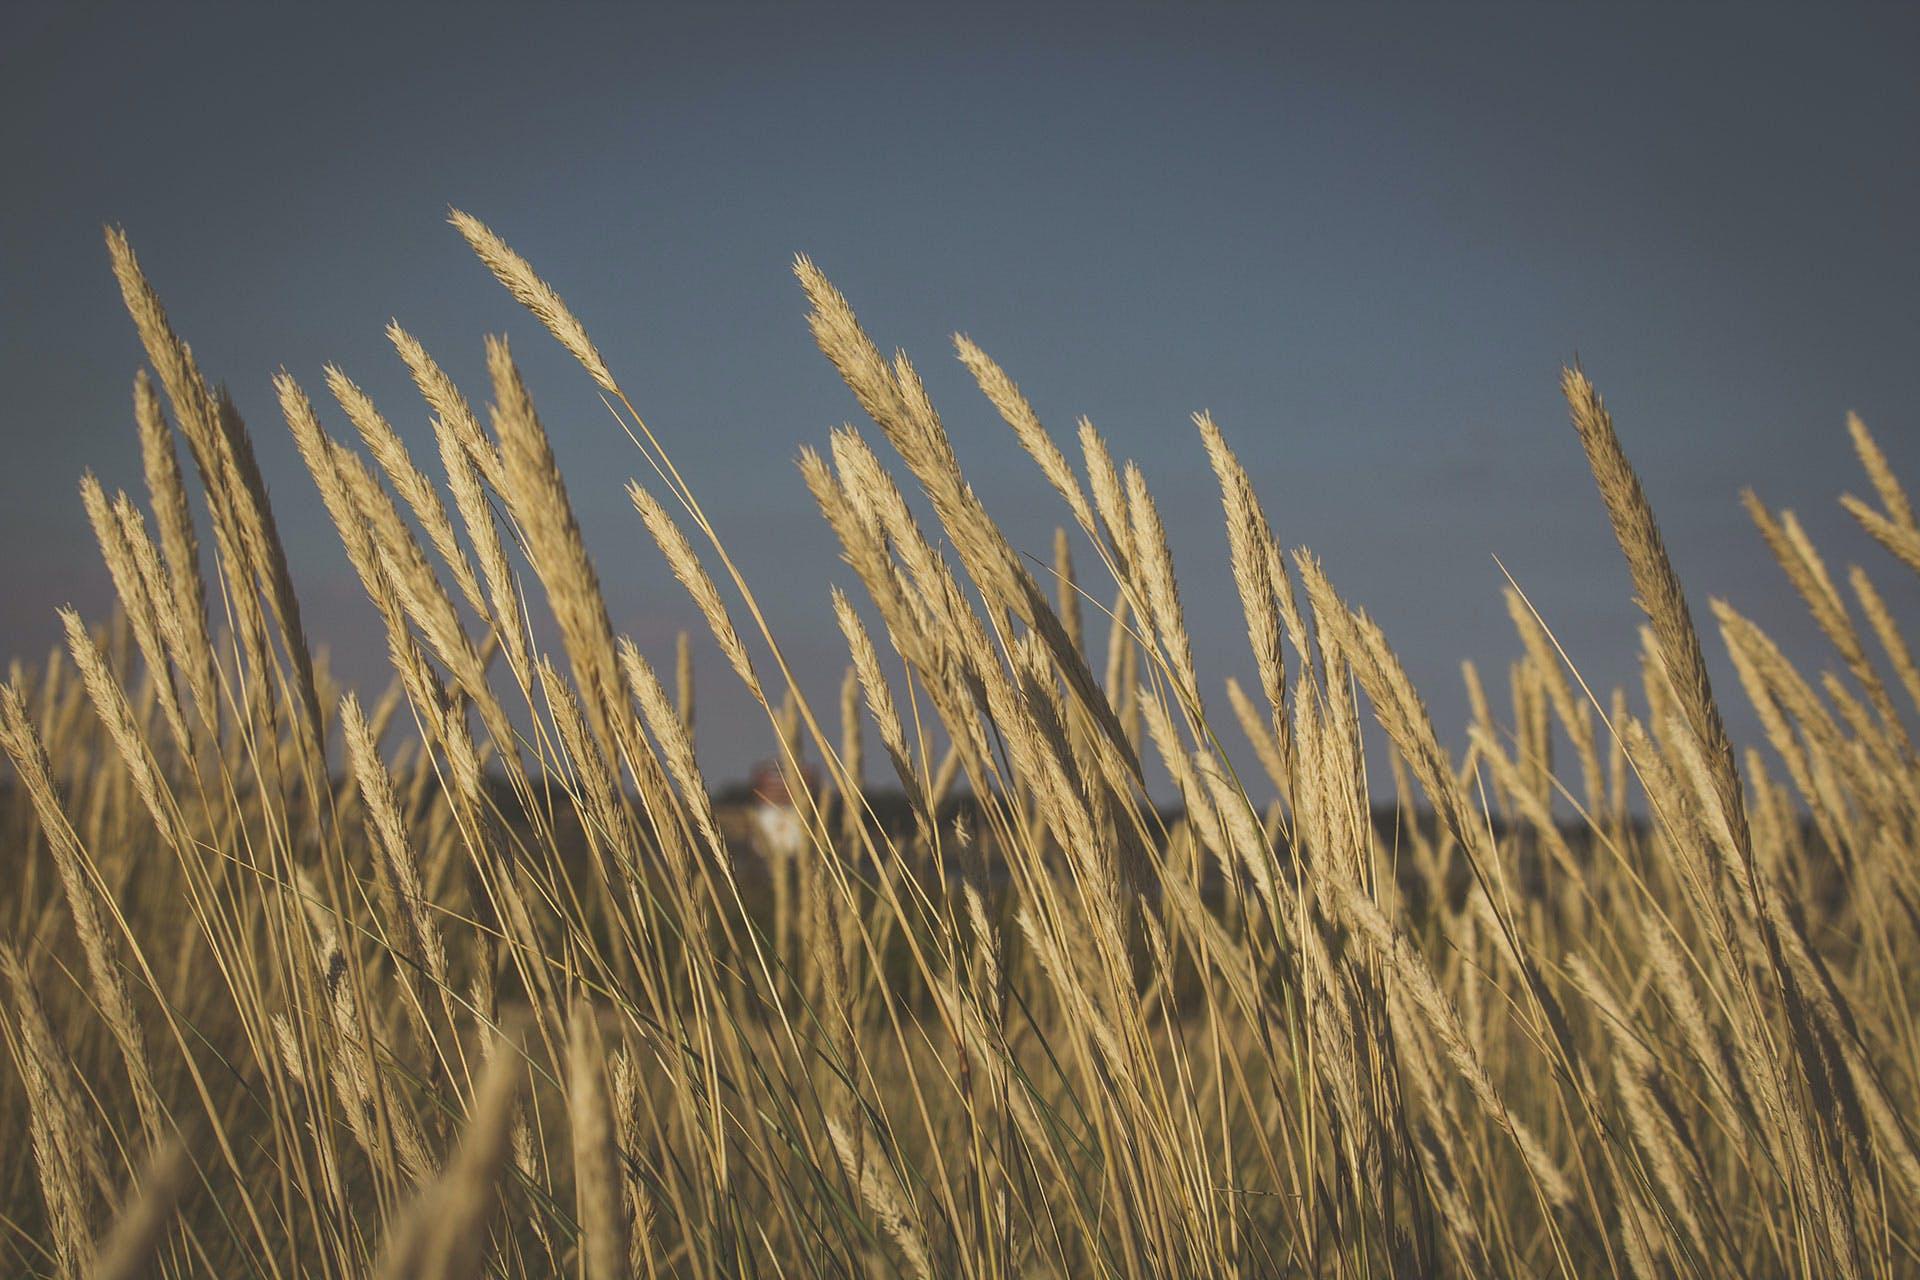 Close-up Photography of Pampas Grass